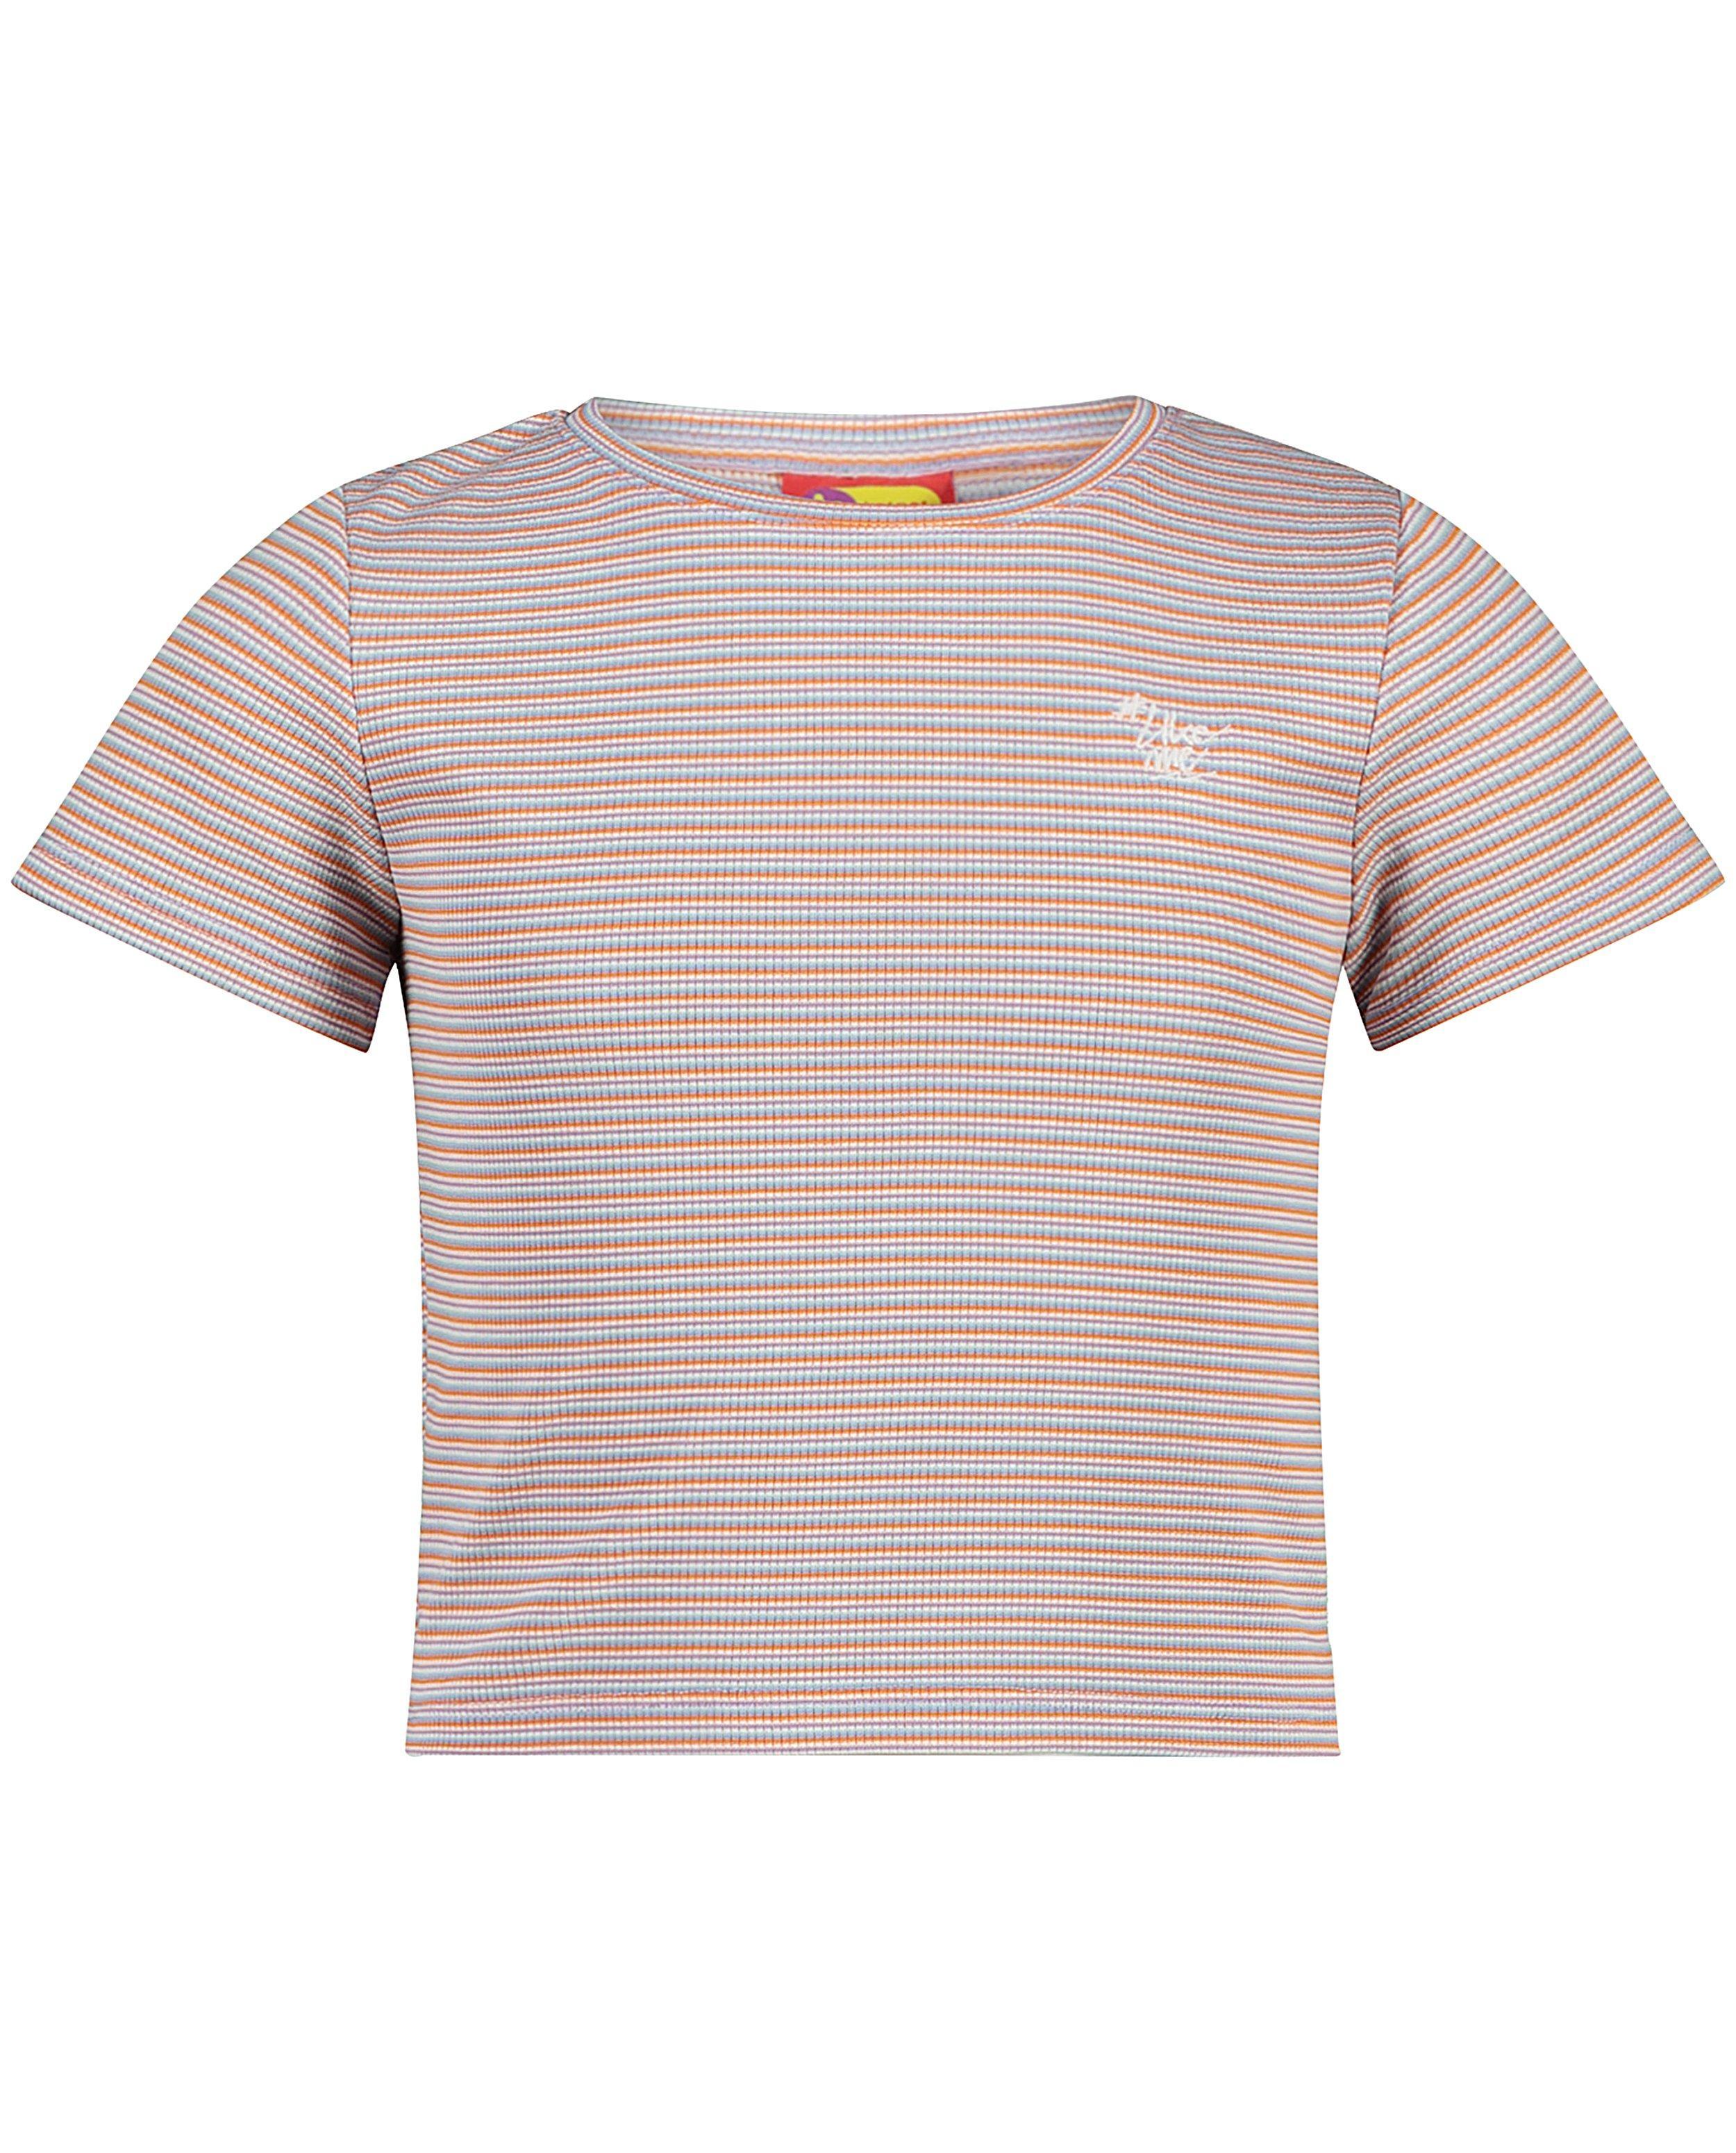 T-shirts - T-shirt rayé #LikeMe